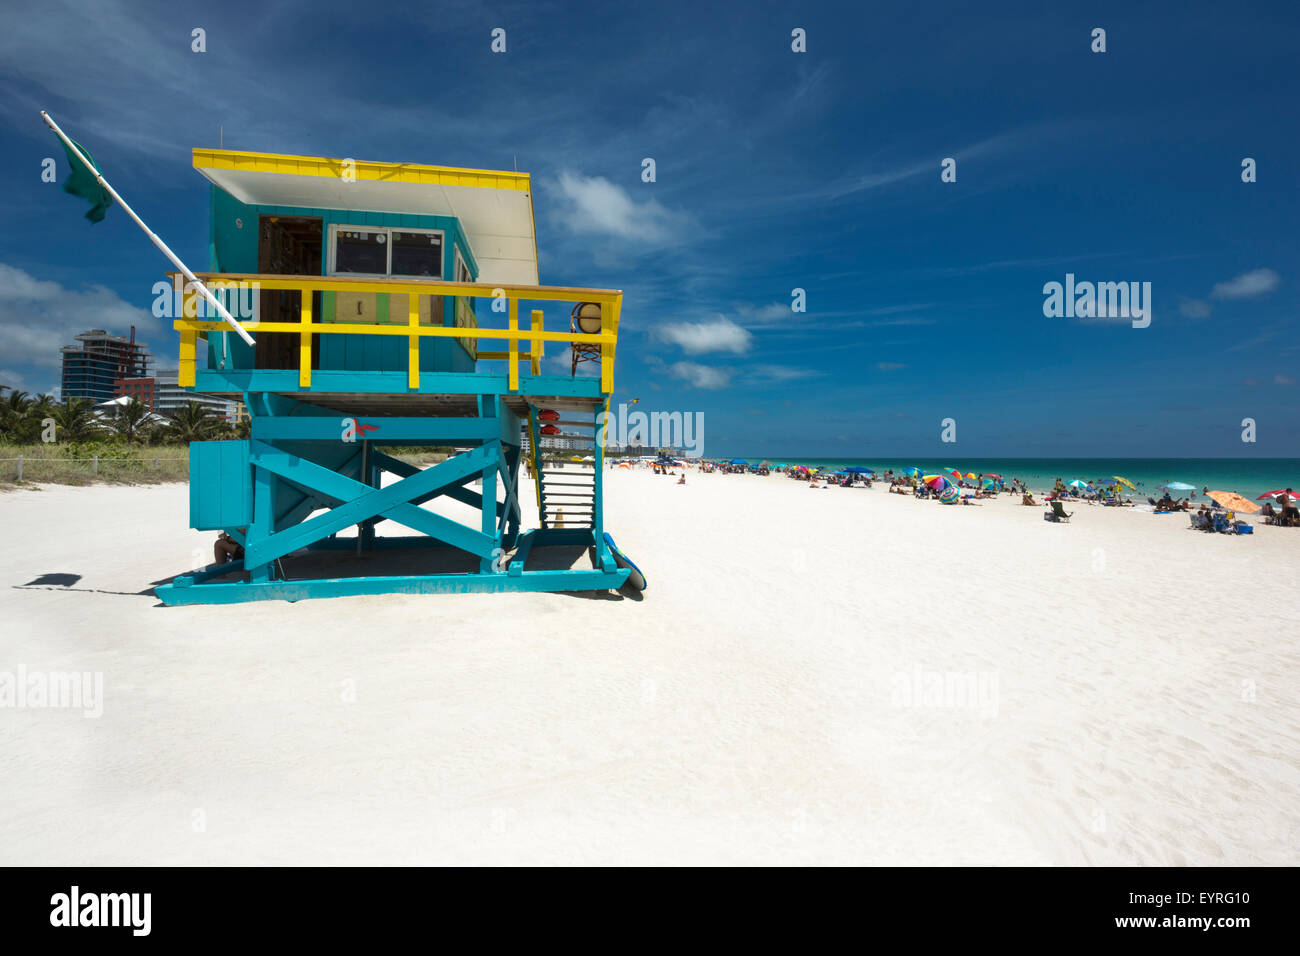 LIFEGUARD STATION MIAMI BEACH FLORIDA USA - Stock Image